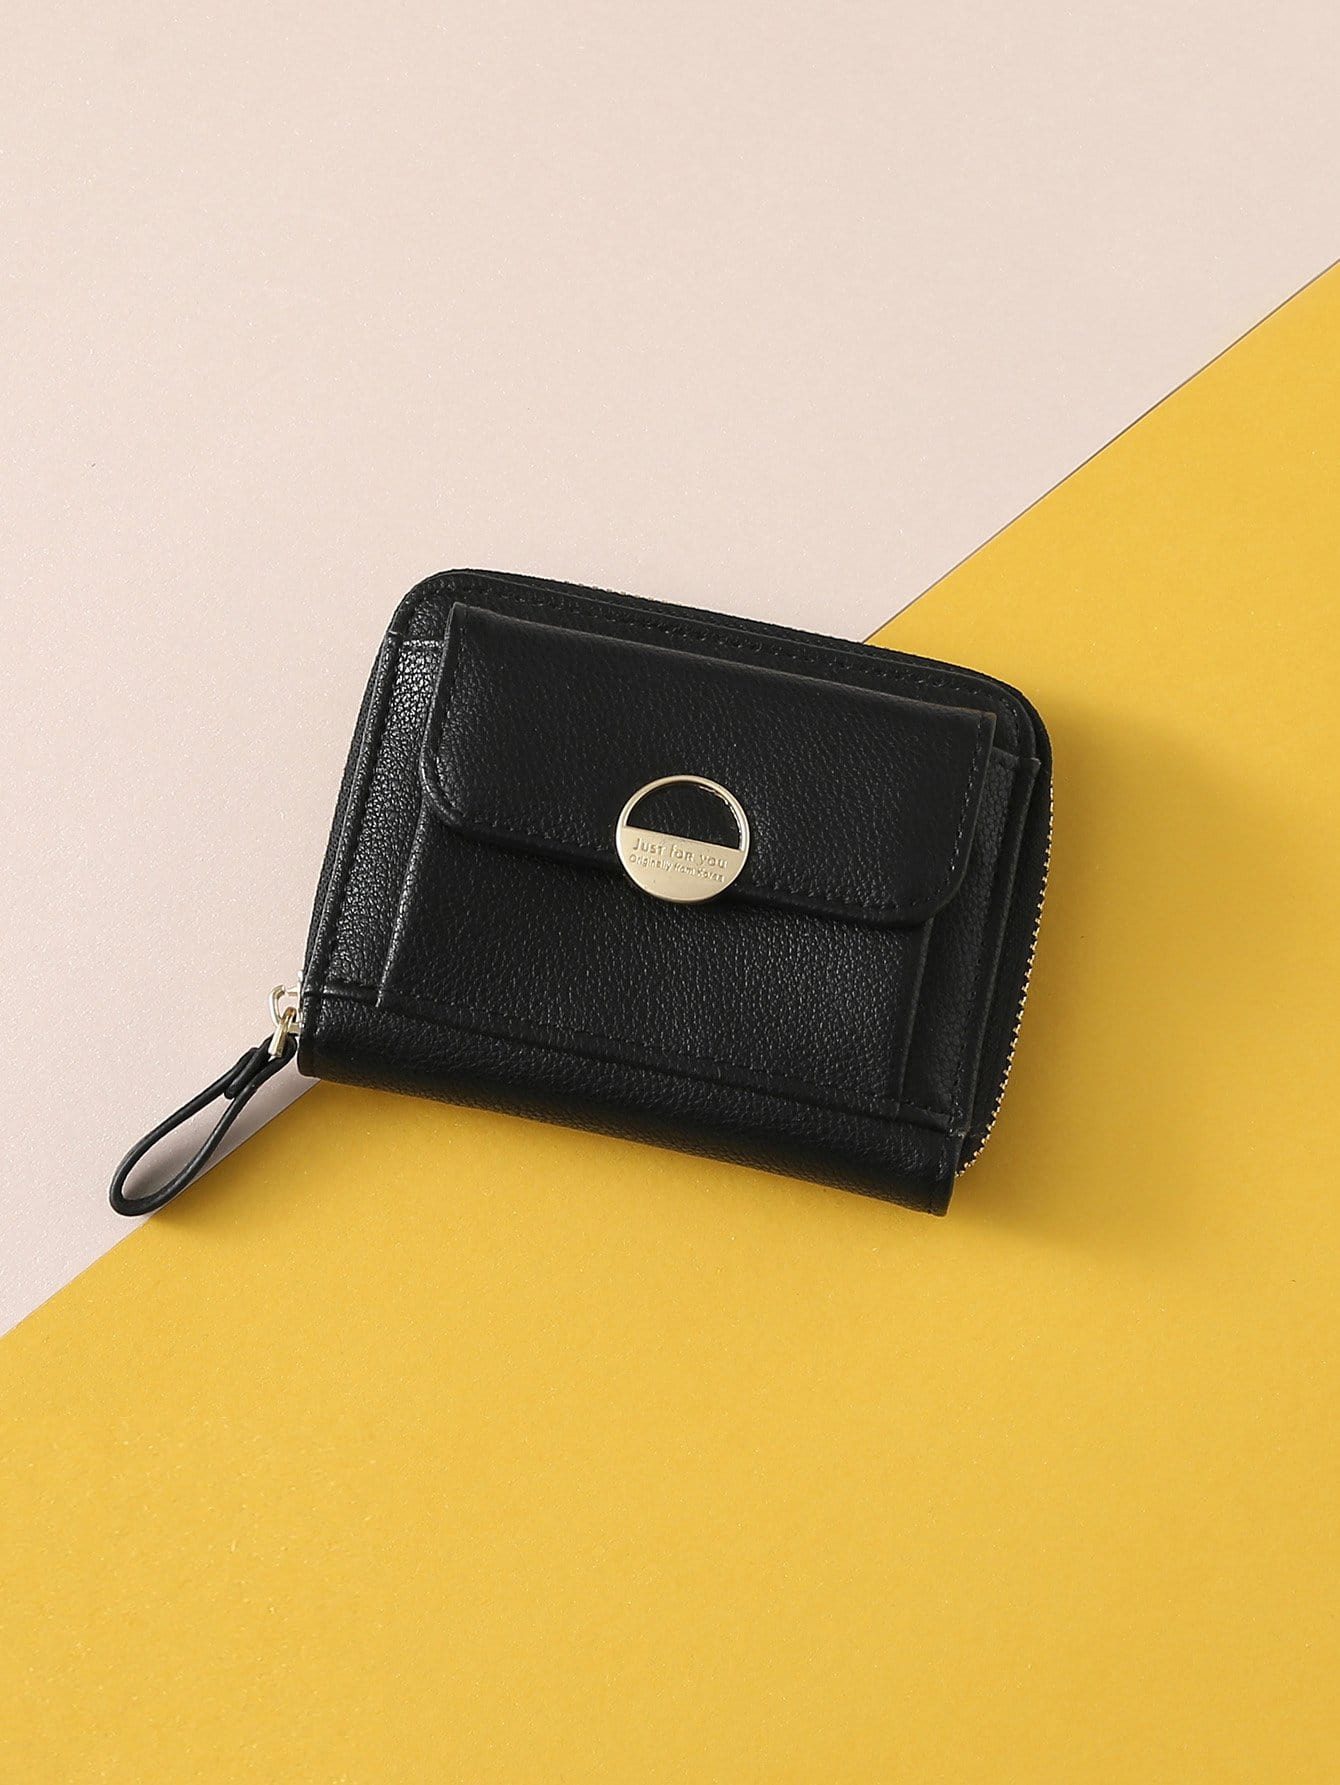 Фото - Zipper Around Coin Purse thinkthendo retro women lady small coin purse mini canvas purse zipper wallet coin key holder pouch handbag